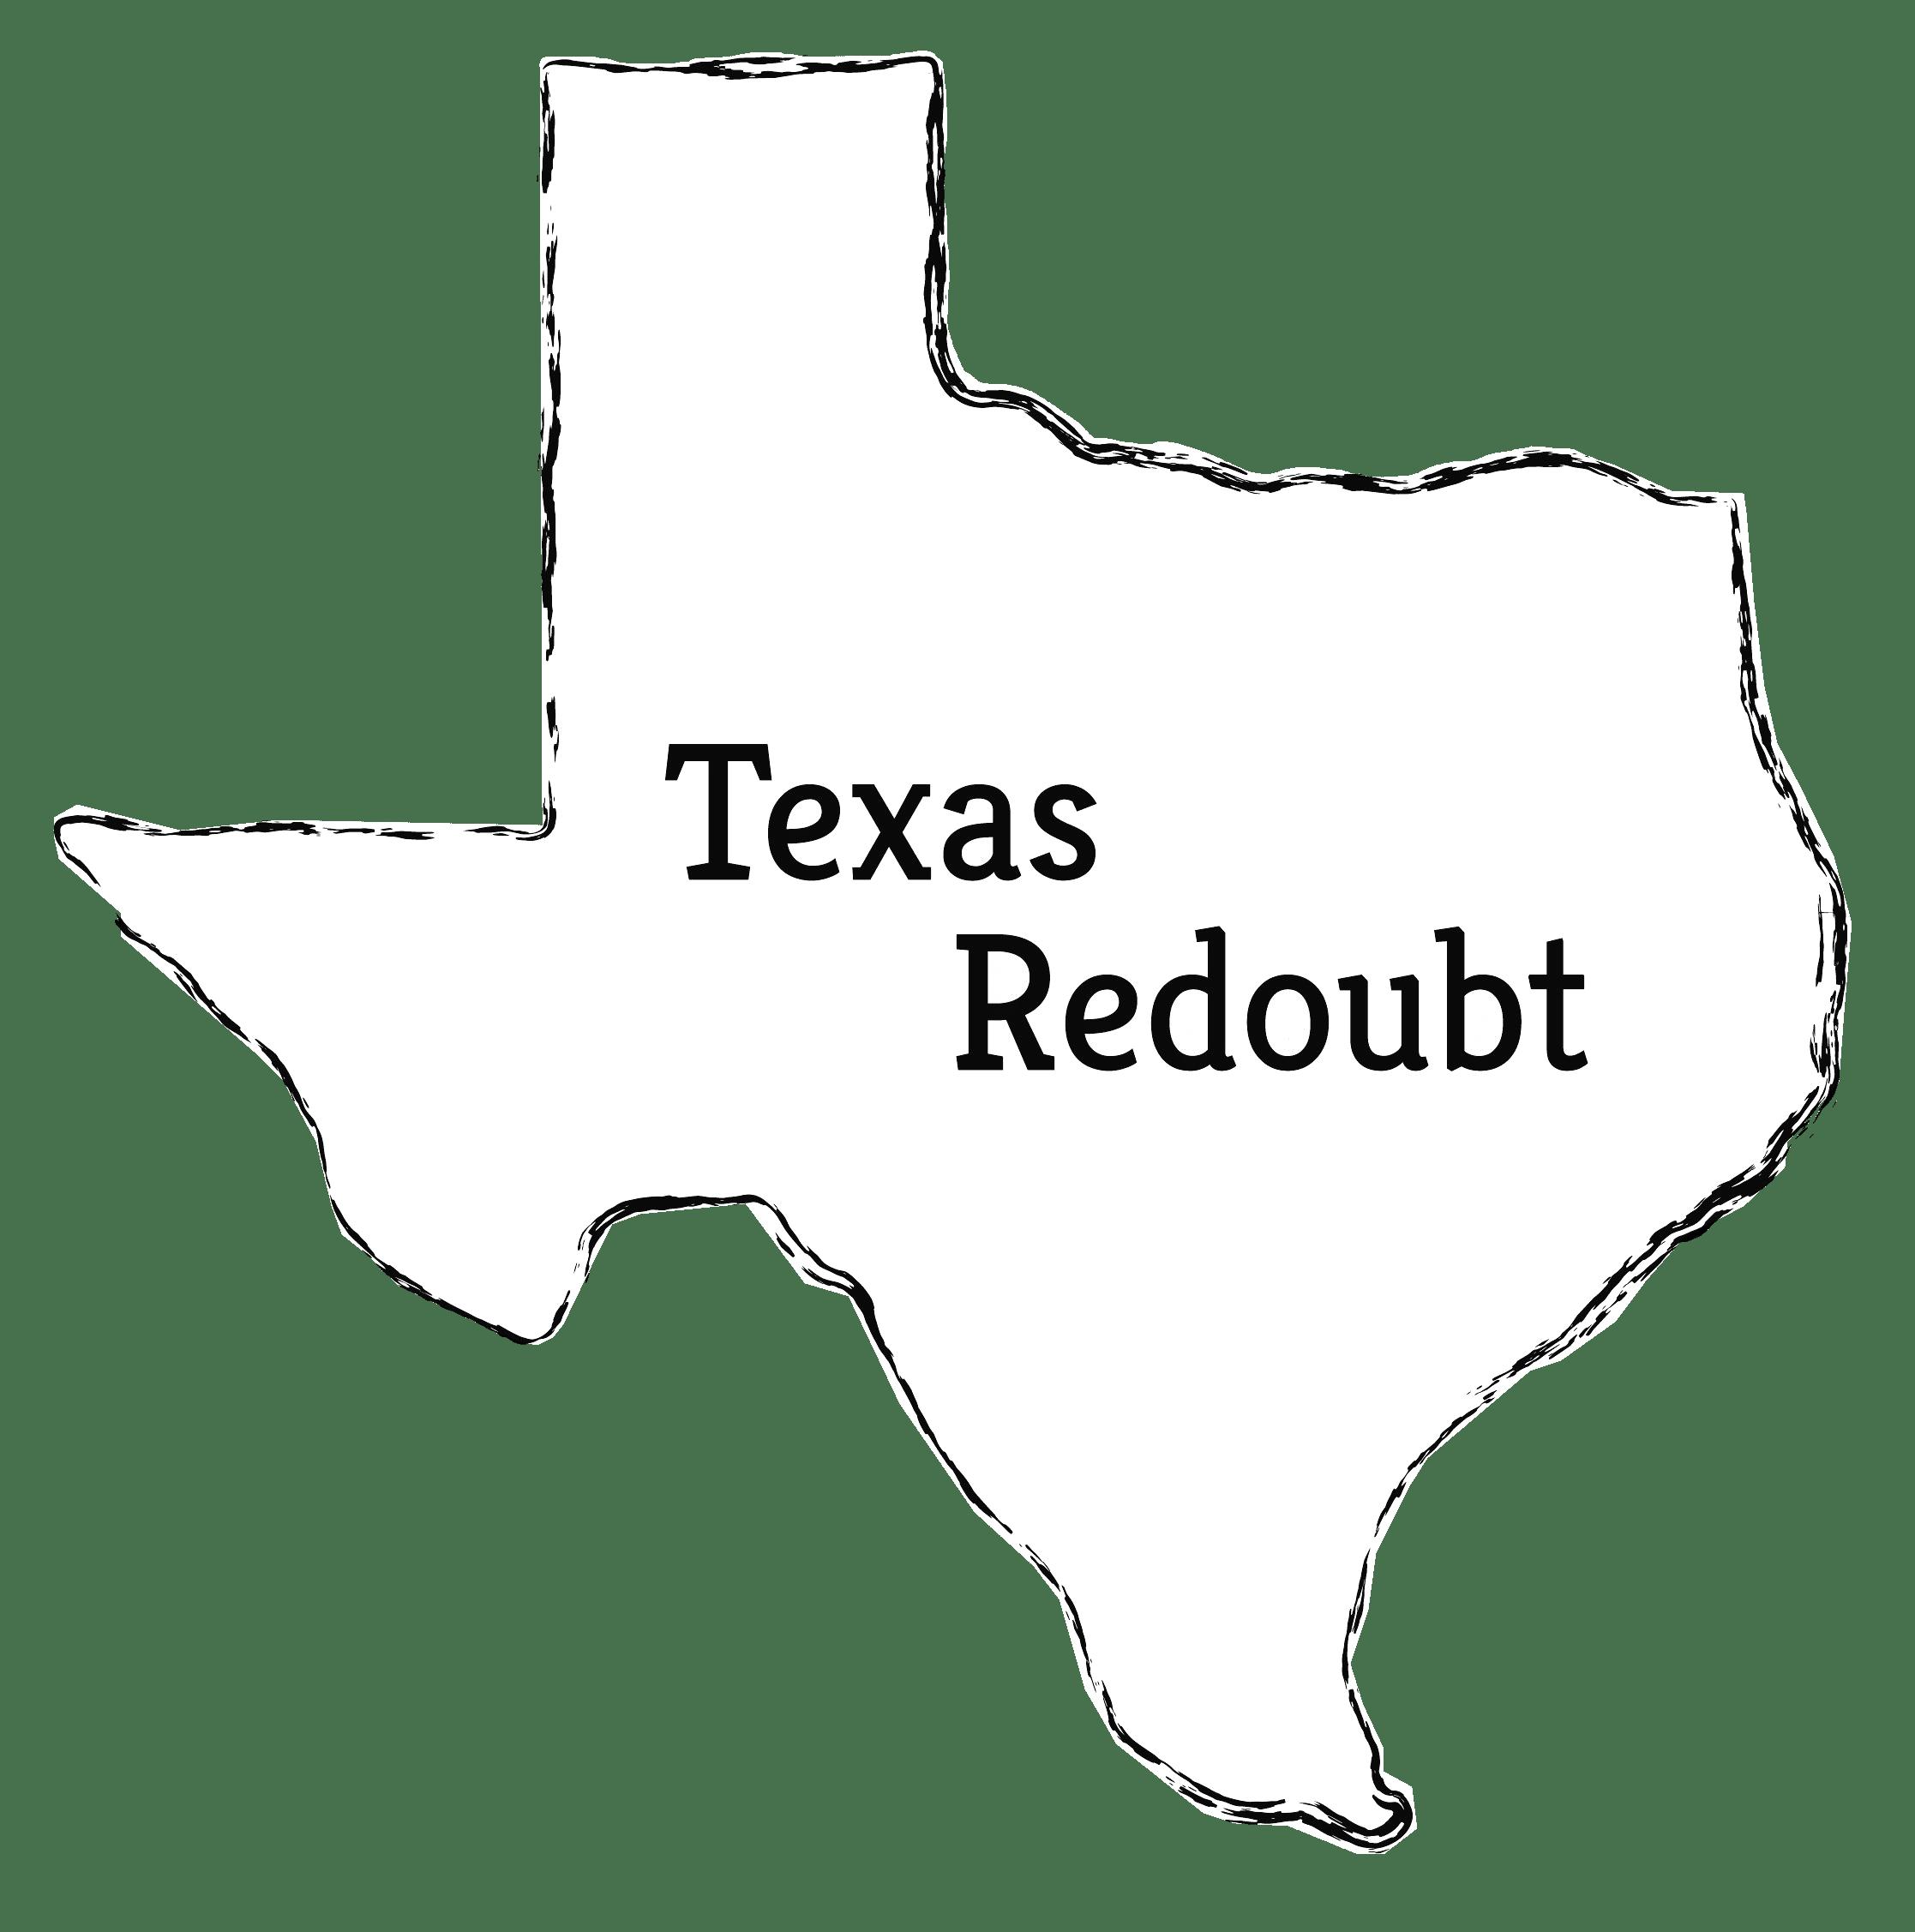 Texas Redoubt Logo